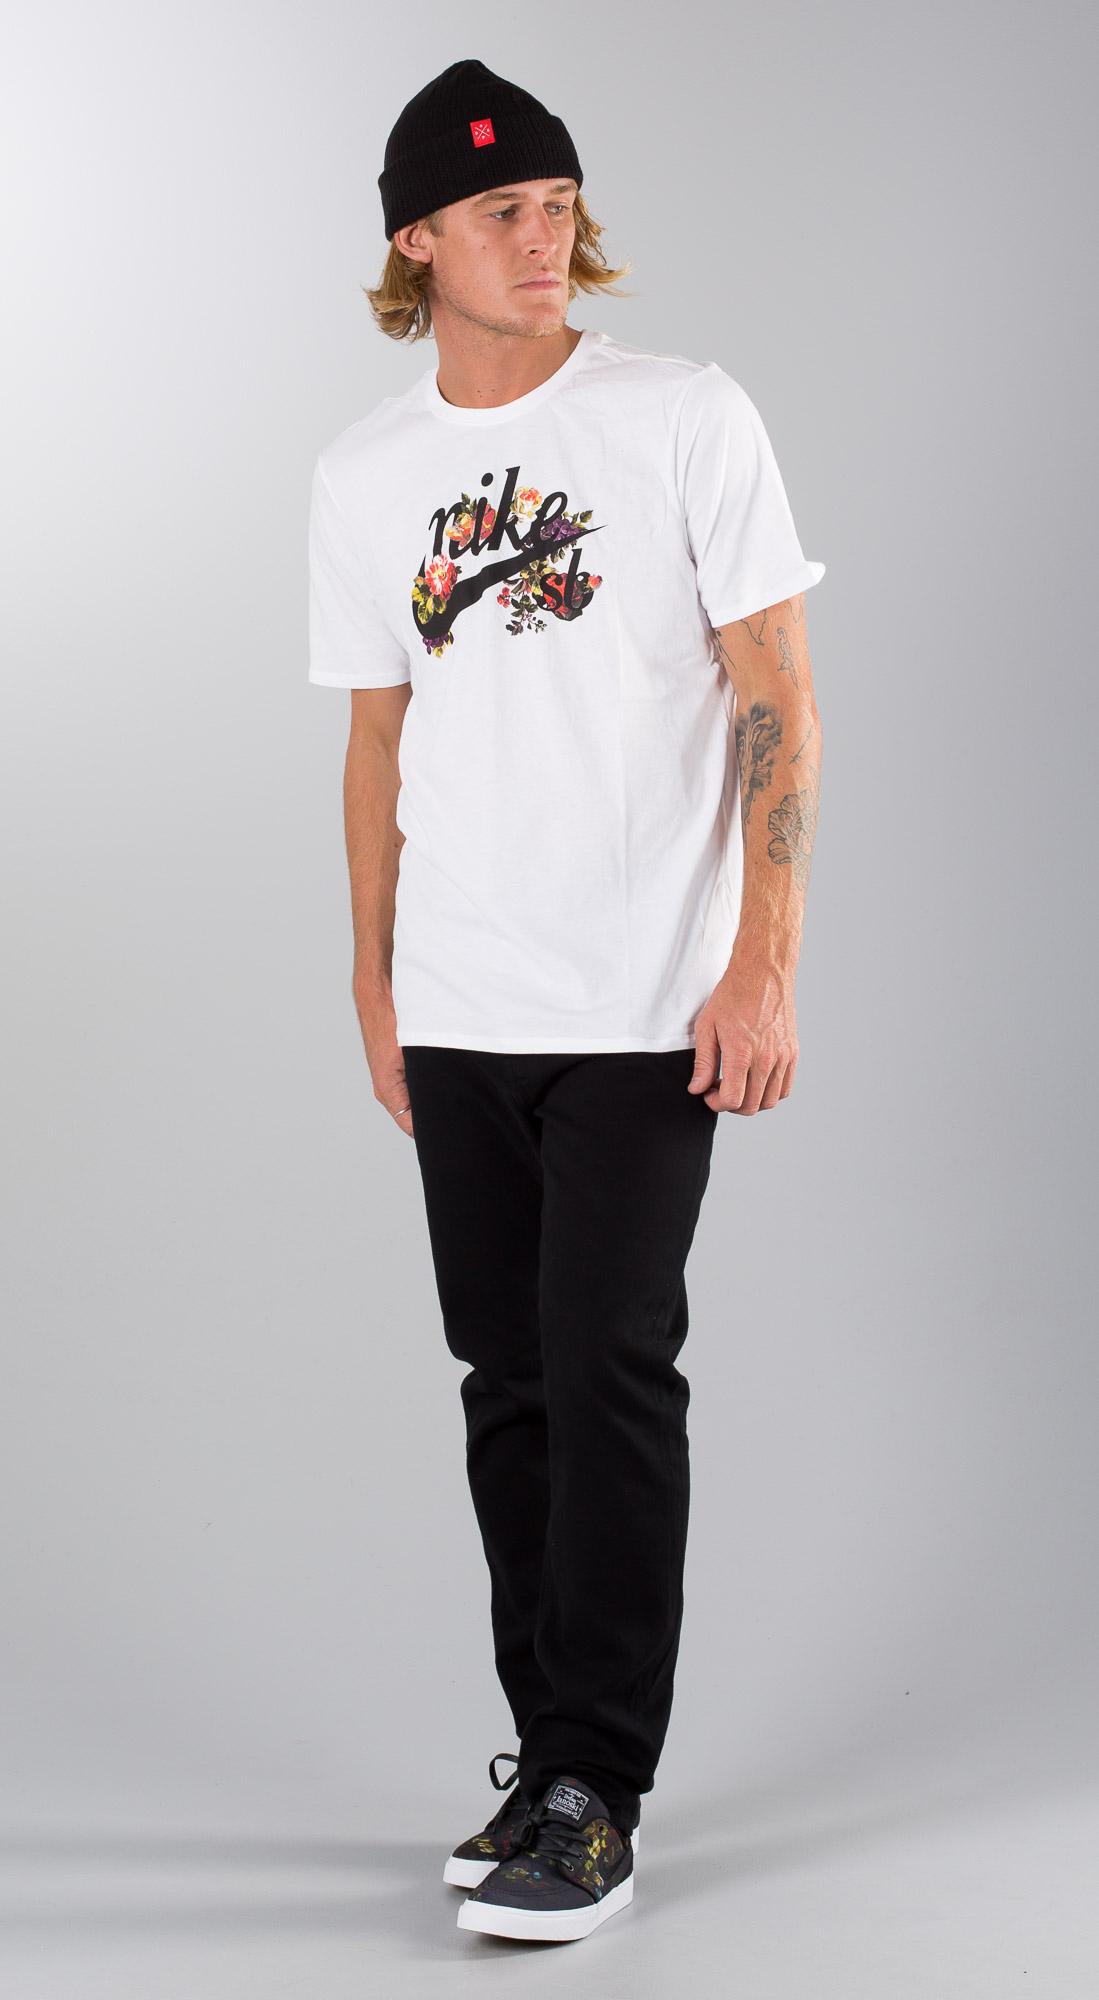 Nike Floral Logo White Black Outfit Ridestore